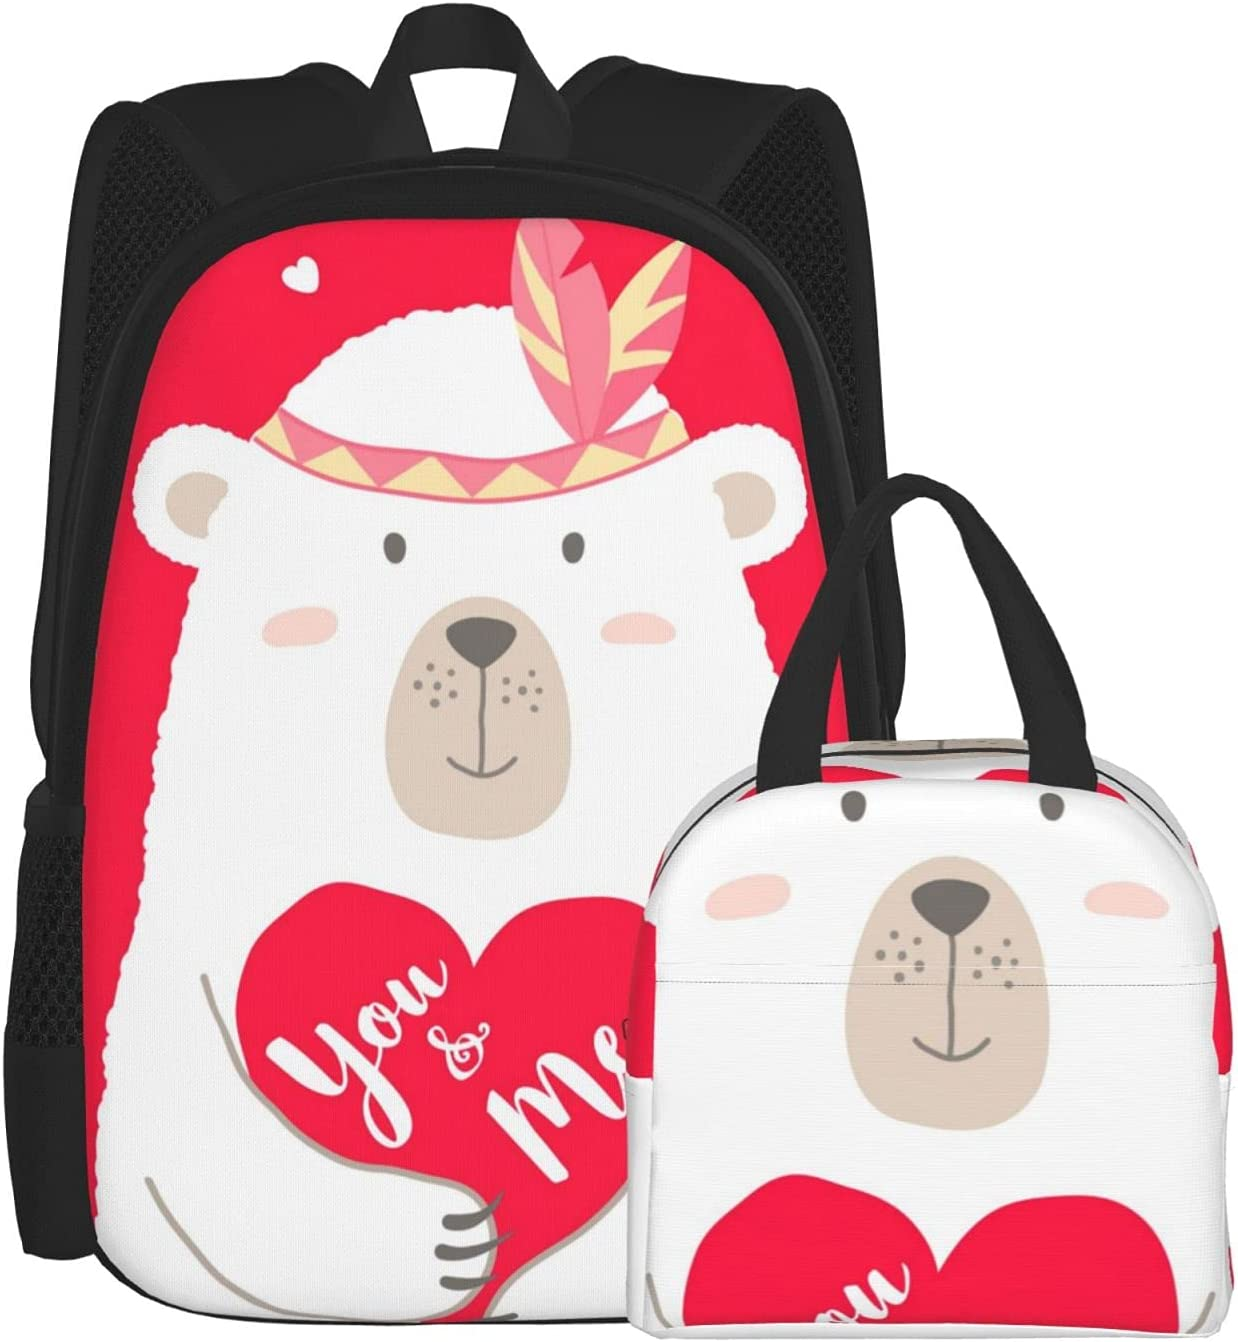 Cute Cartoon Bear Holding Heart Long-awaited Backpacks Gir Albuquerque Mall with Box Lunch for